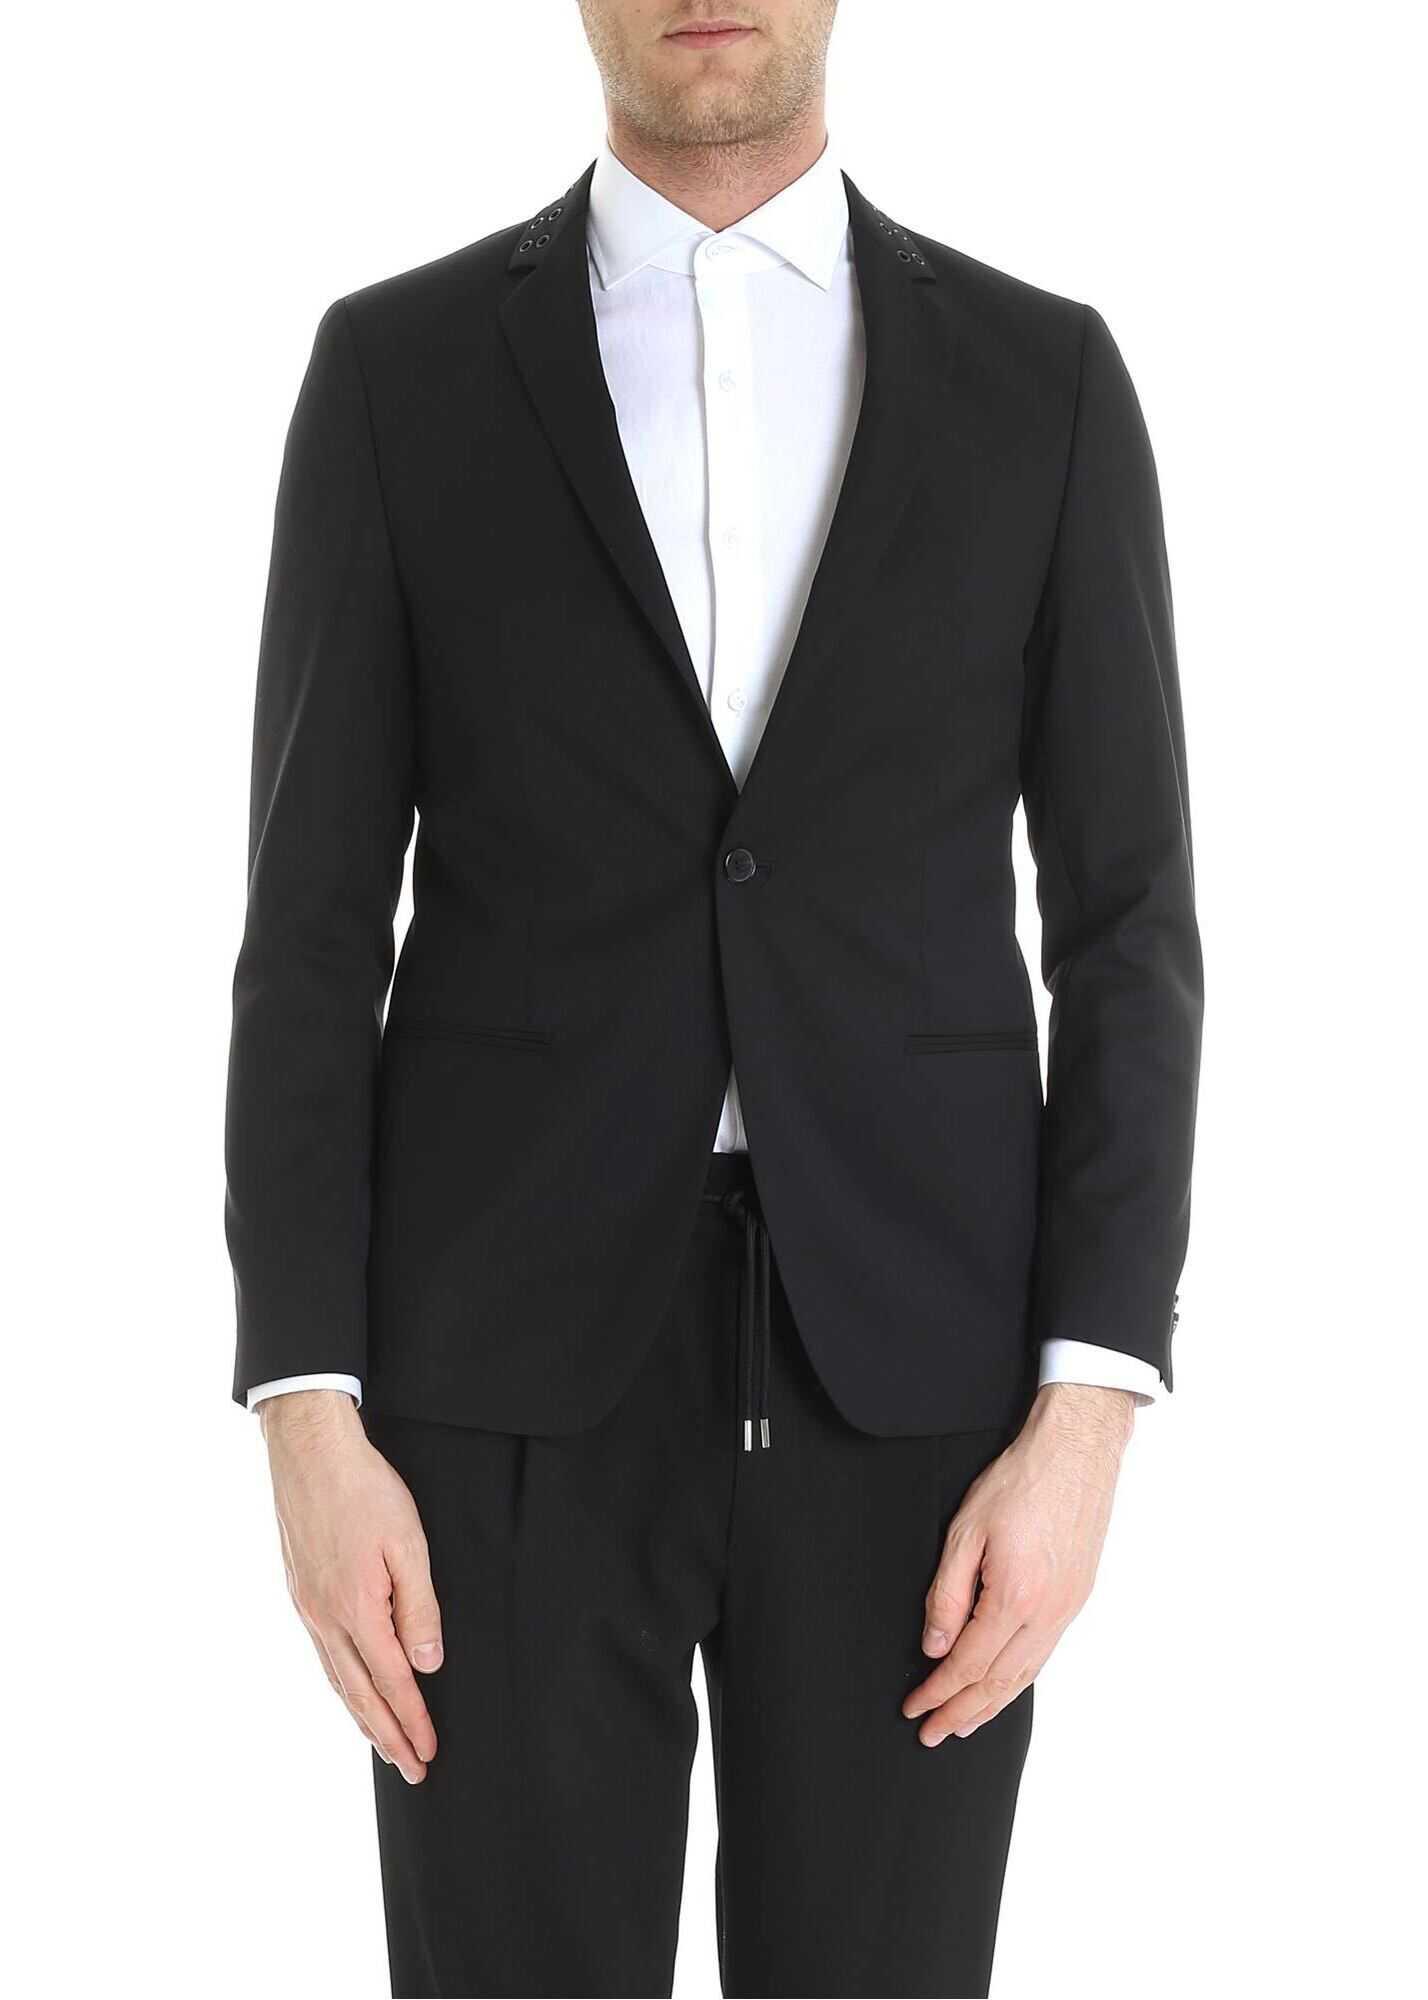 Karl Lagerfeld Knight Lined Jacket In Black Black imagine